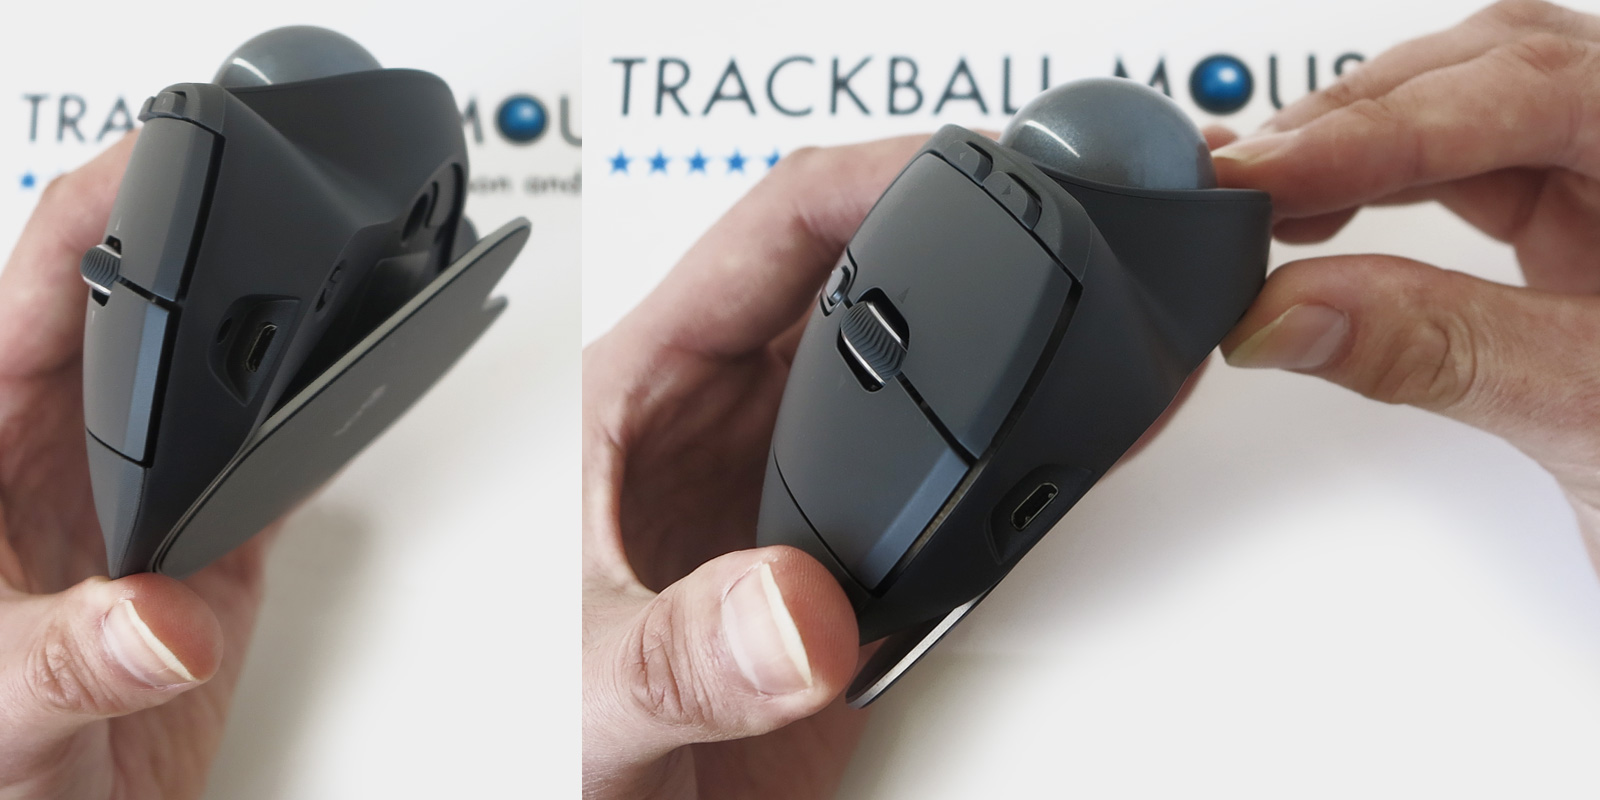 Logitech MX ERGO Wireless Trackball - Trackball Mouse Reviews